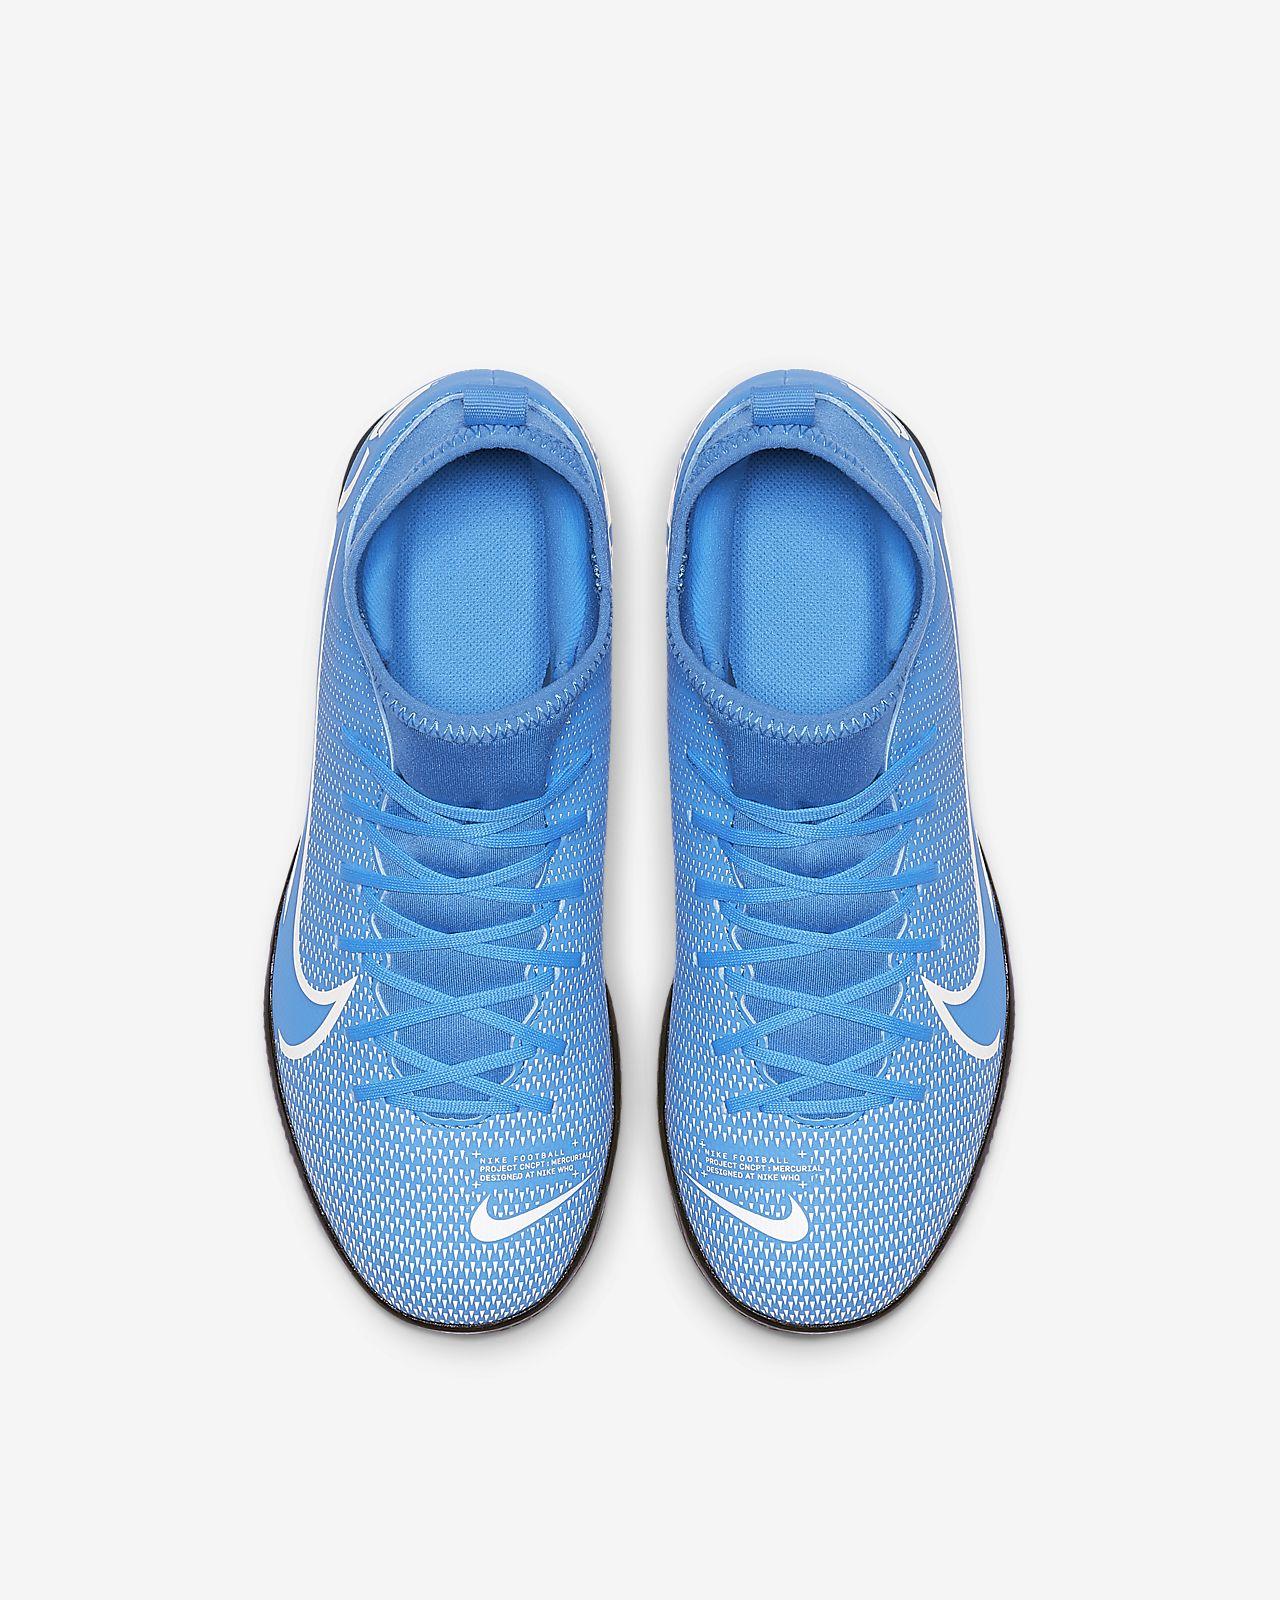 Nike JR SUPERFLY 7 CLUB IC AT8153 414